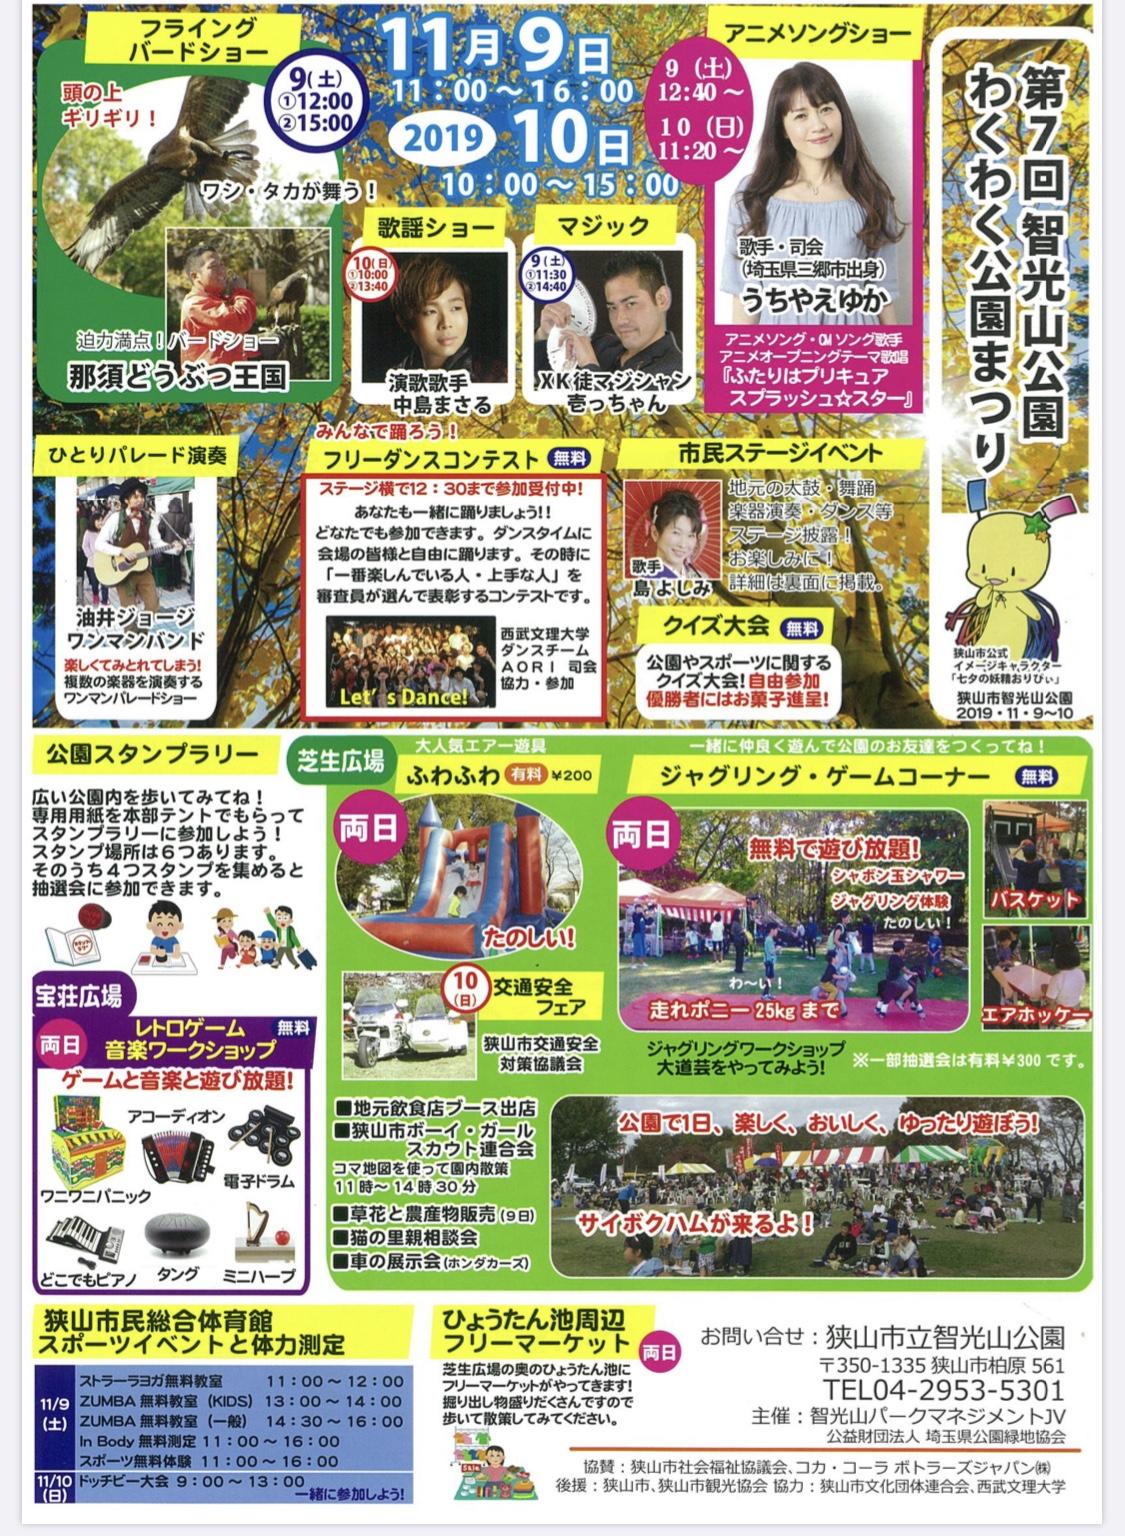 埼玉県狭山市イベント詳細